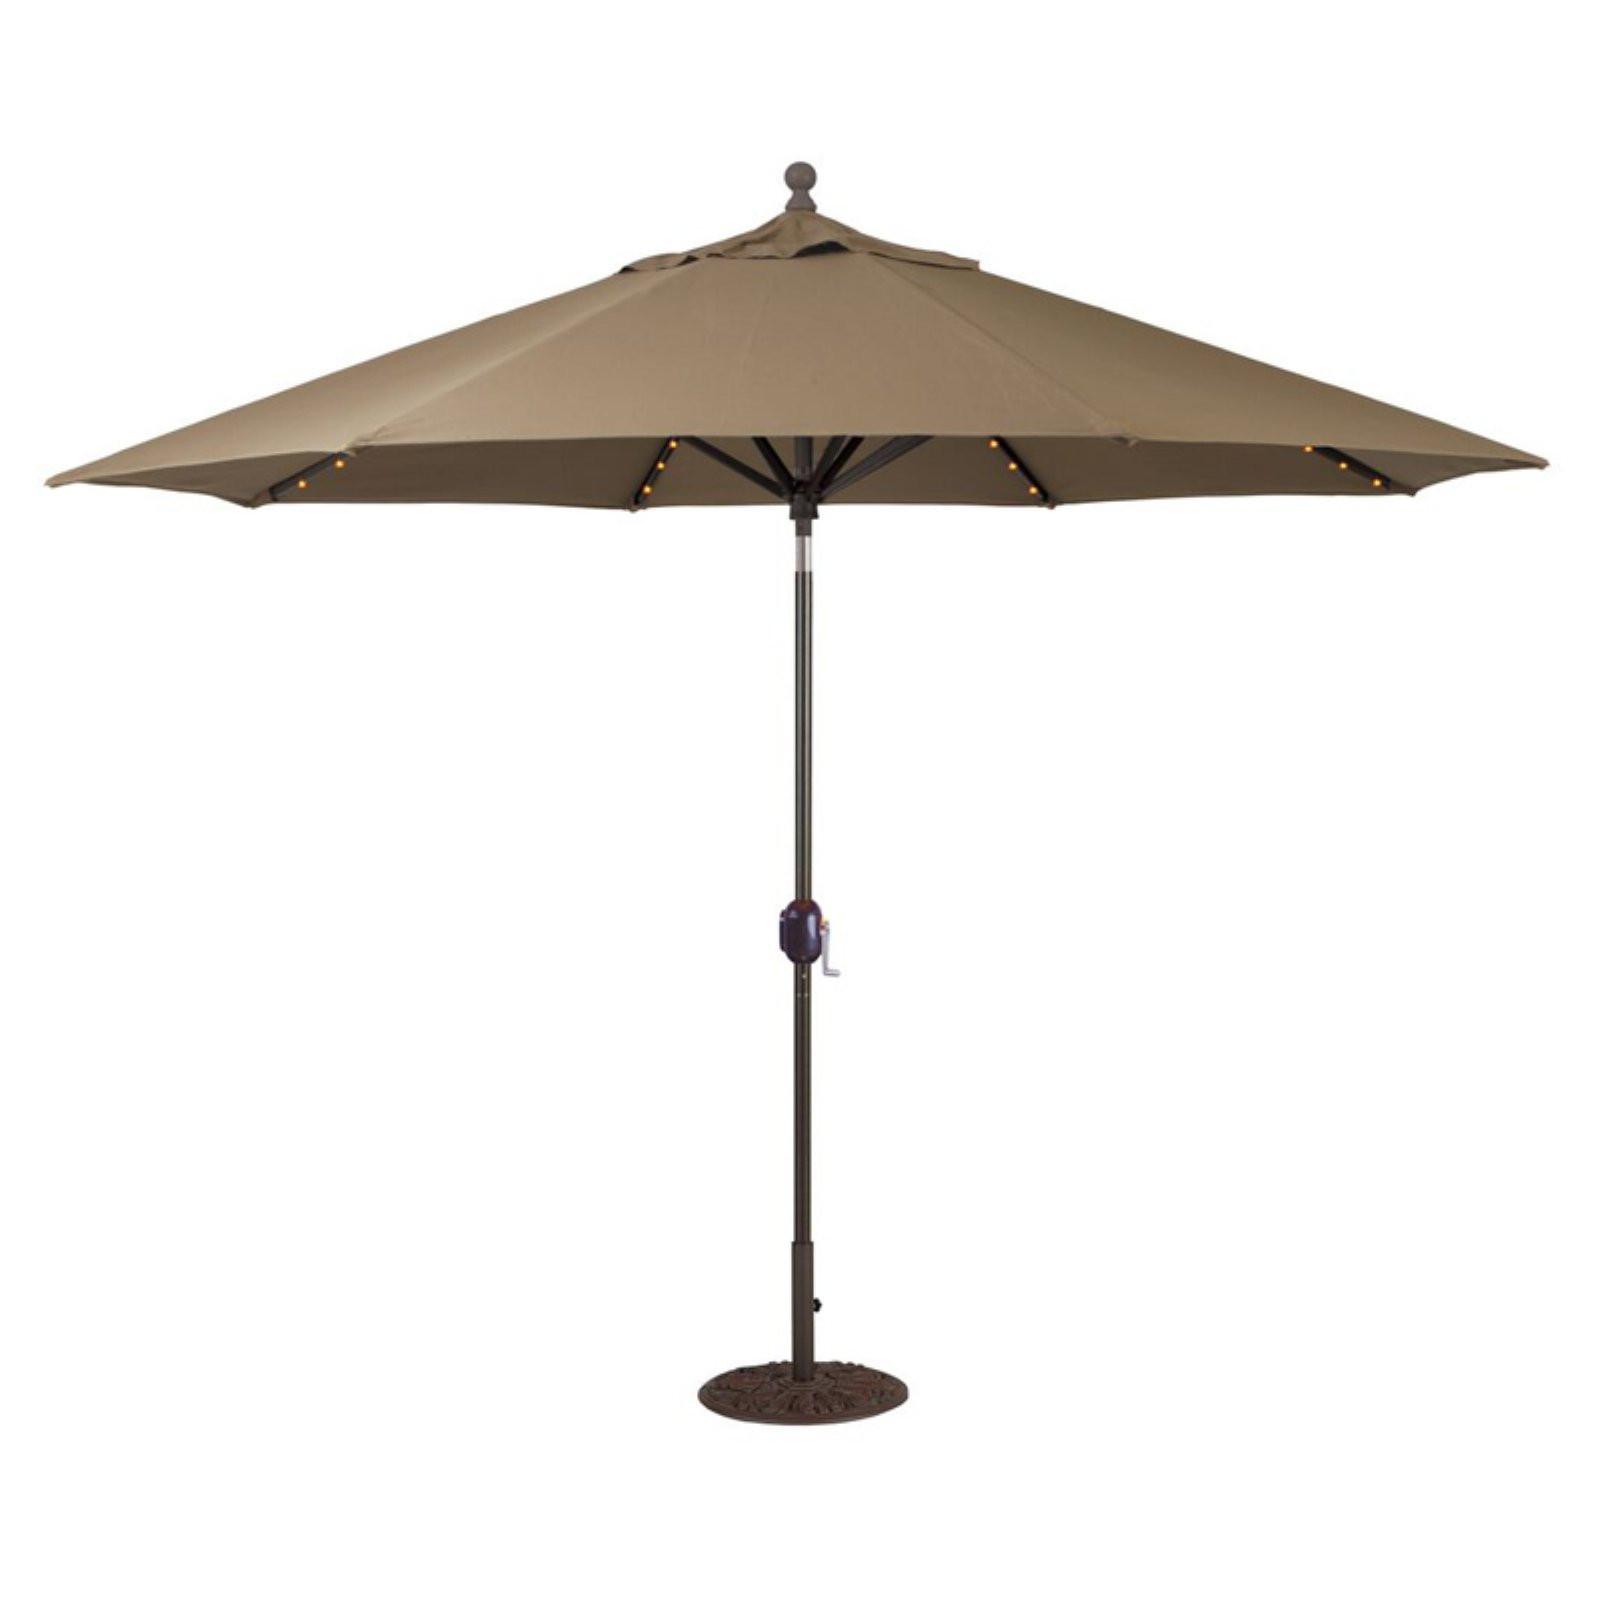 Best ideas about Sunbrella Patio Umbrellas . Save or Pin Galtech Sunbrella 11 ft Auto Tilt Patio Umbrella with LED Now.